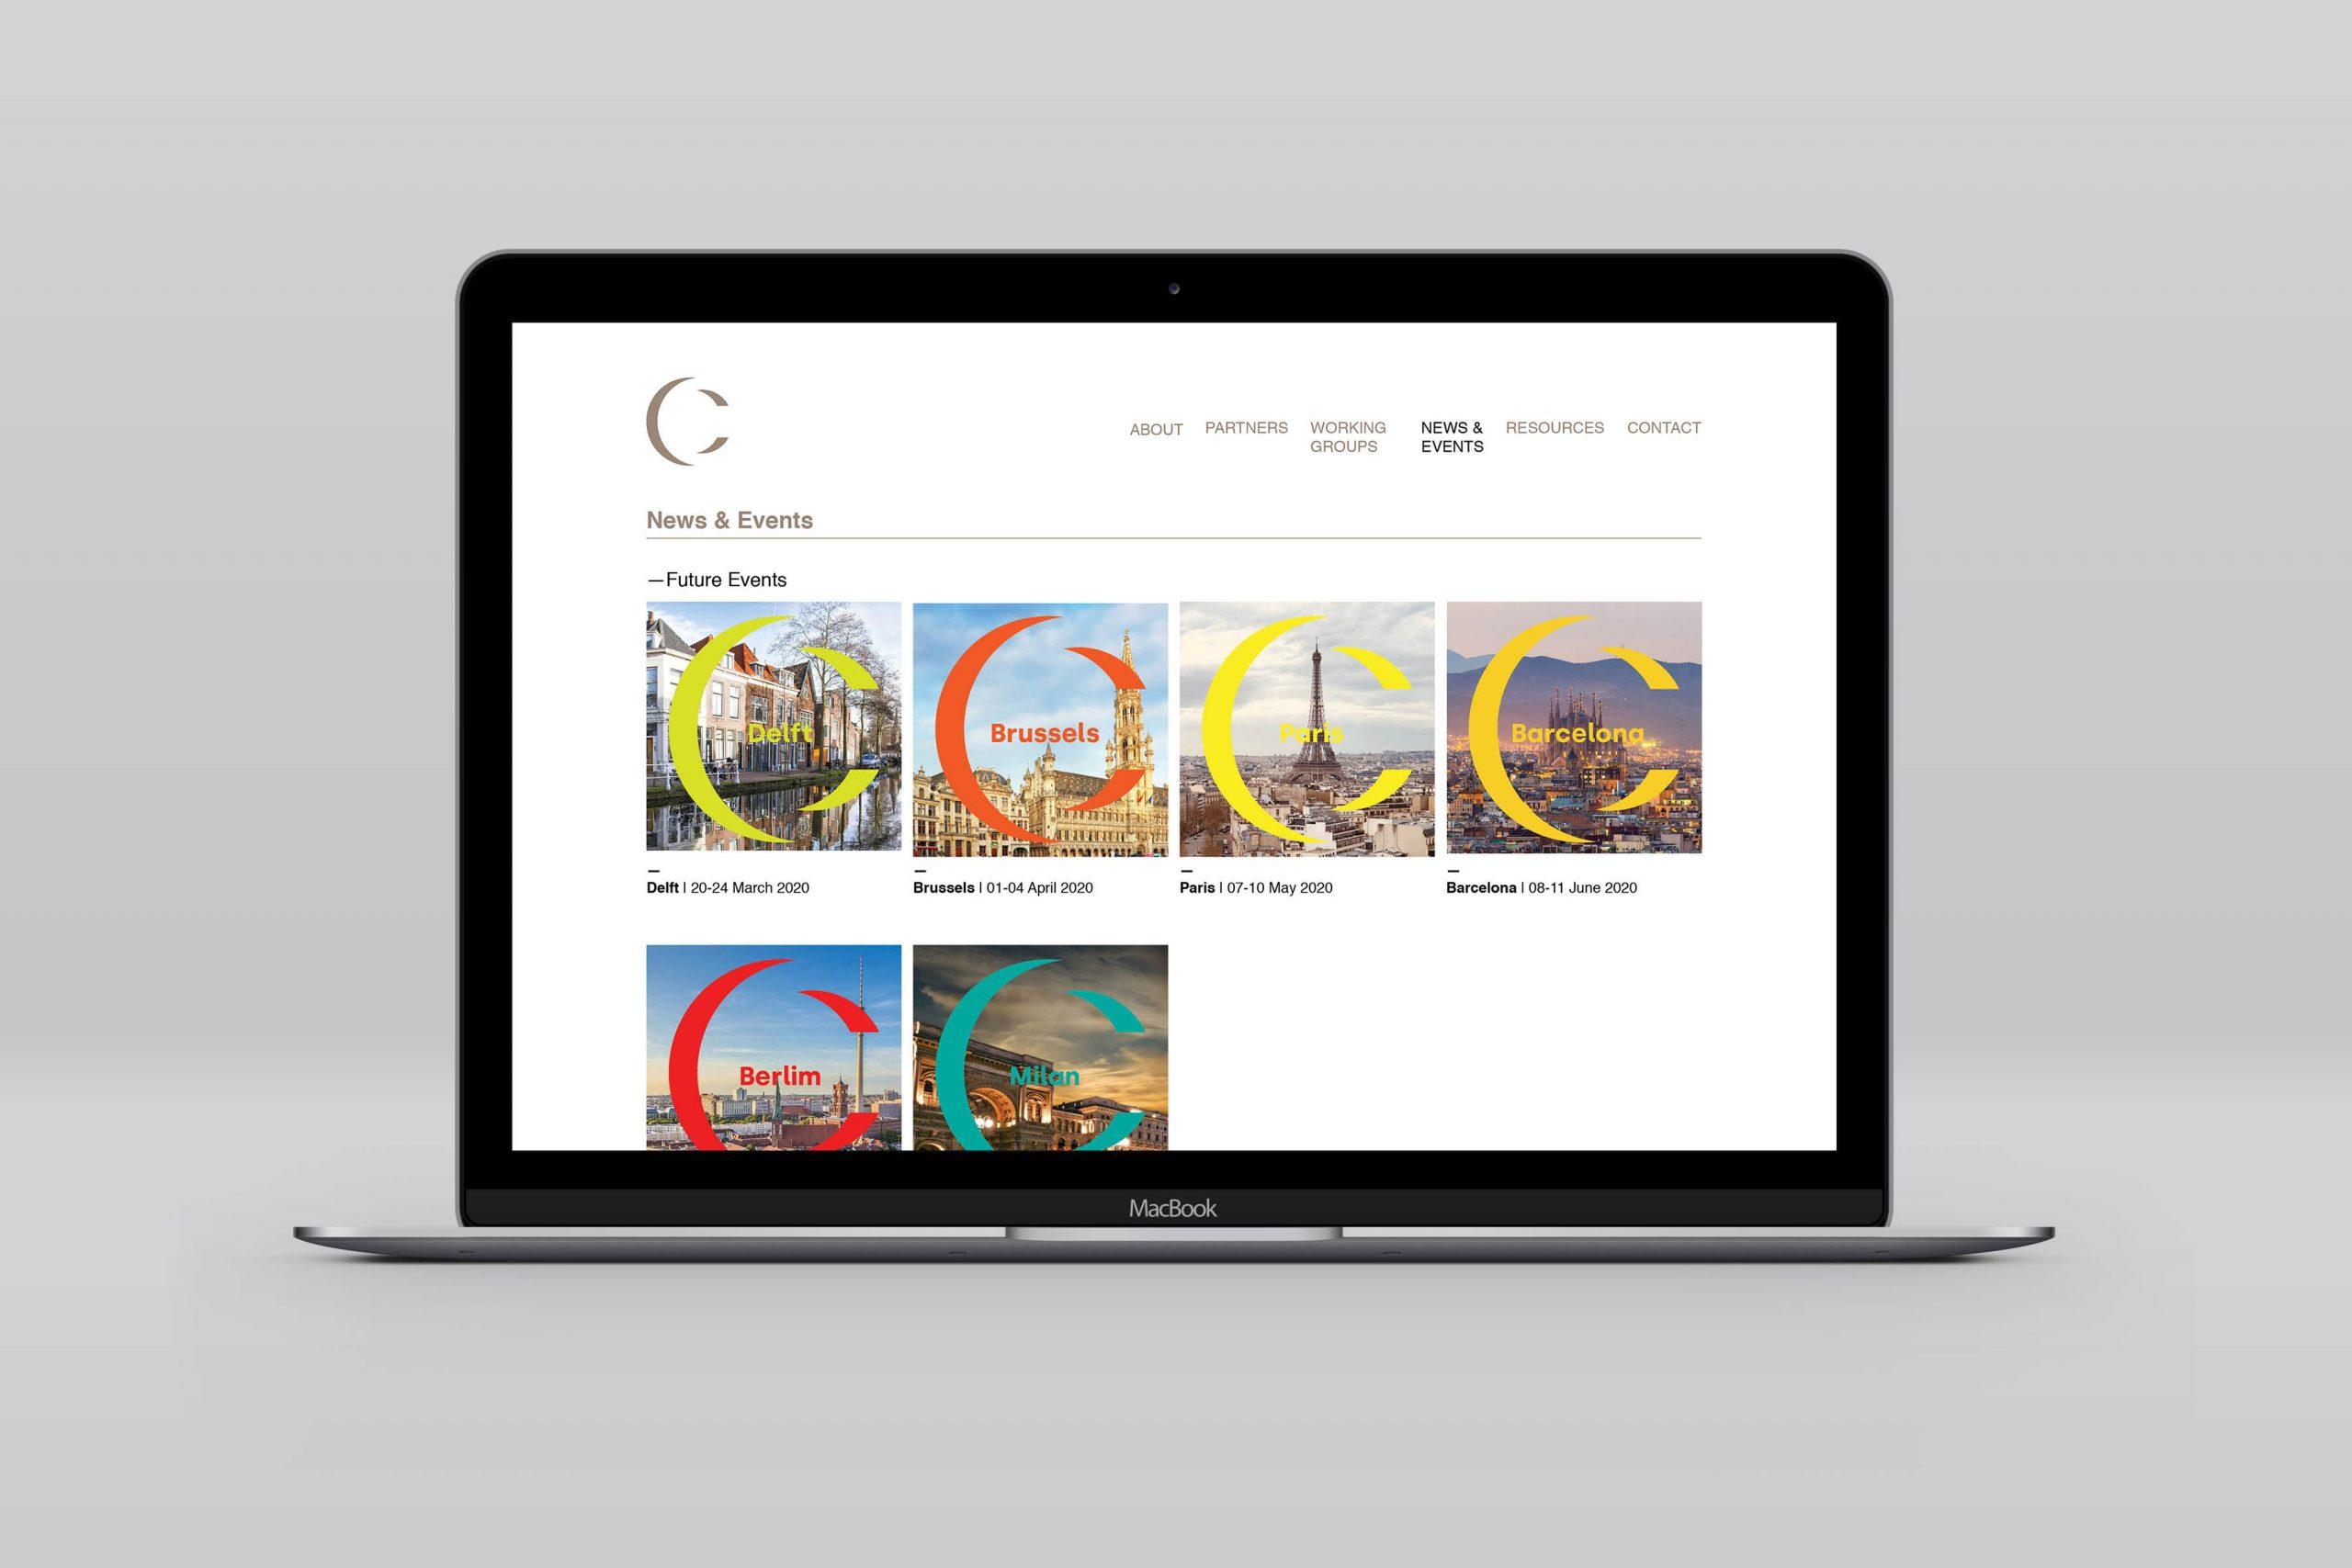 Bitflow-studio-carla-web-design-4